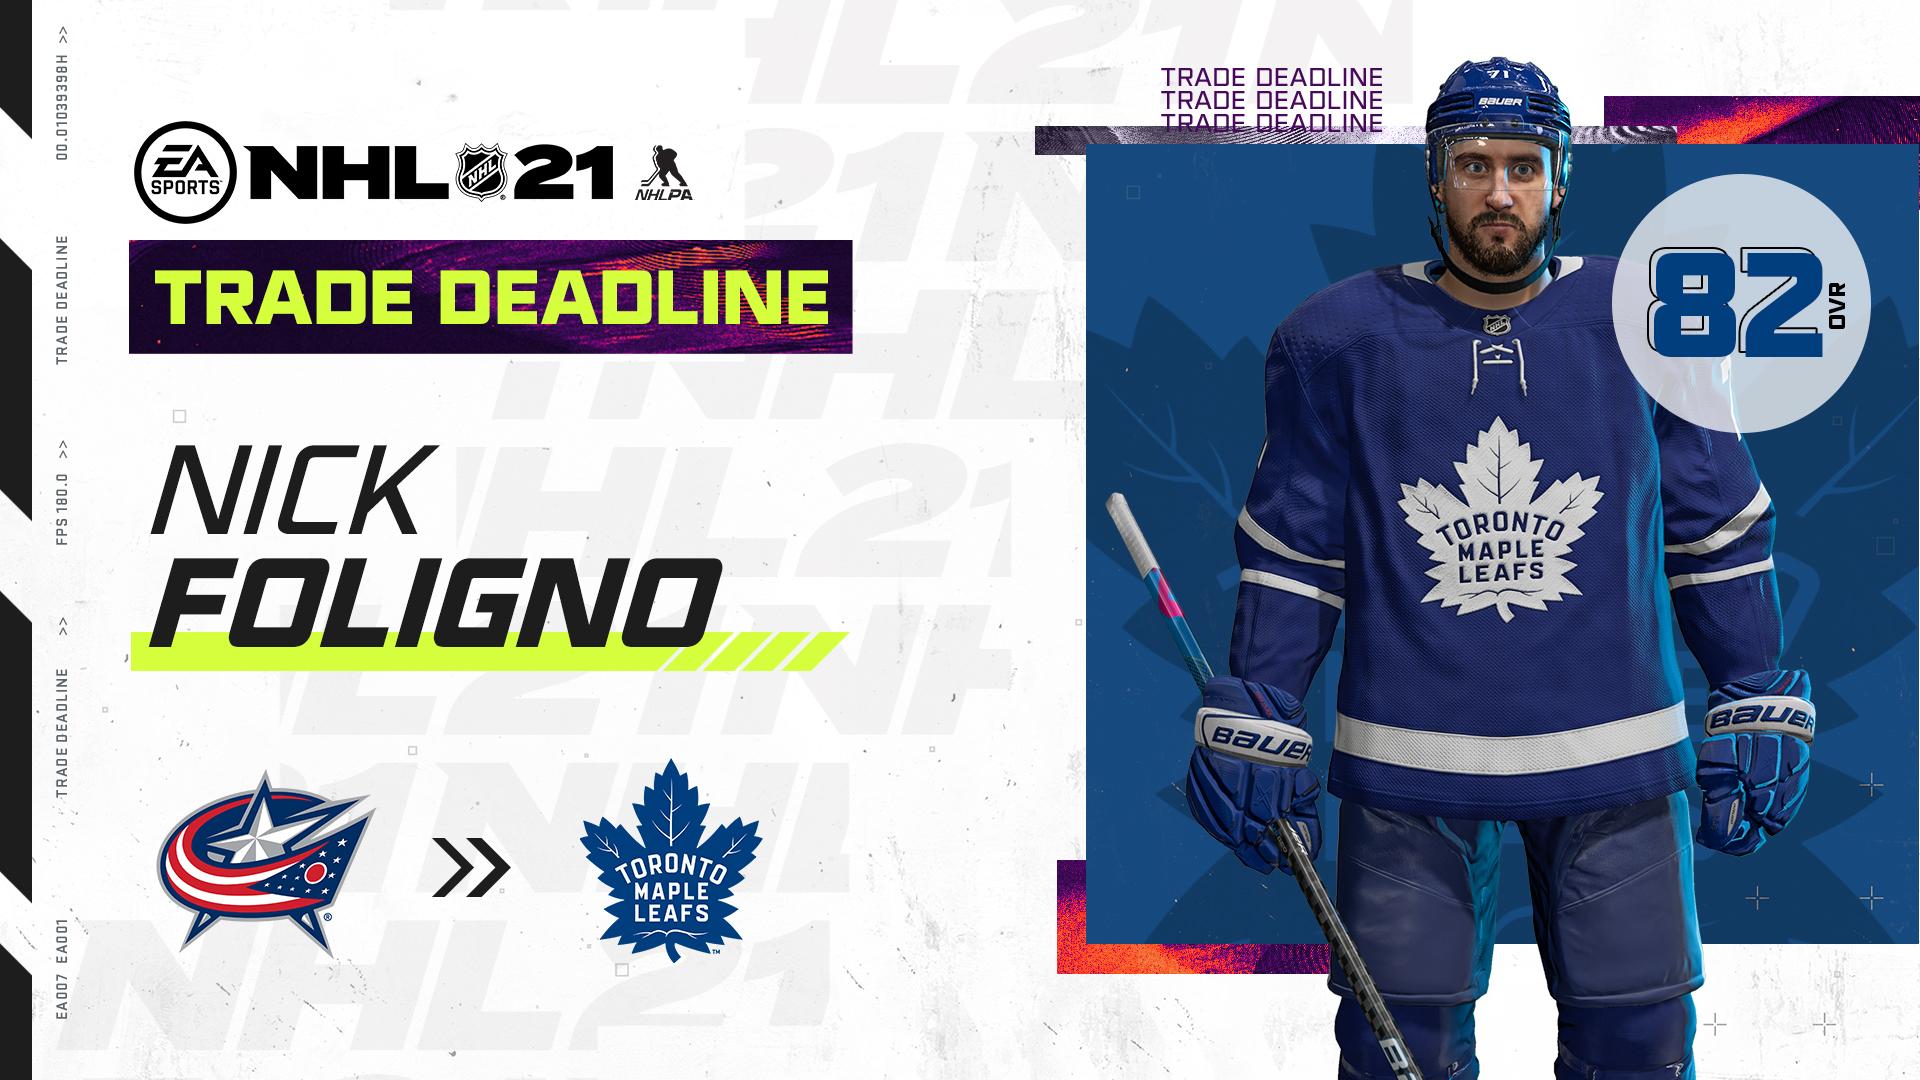 NHL 21 trade deadline - 2